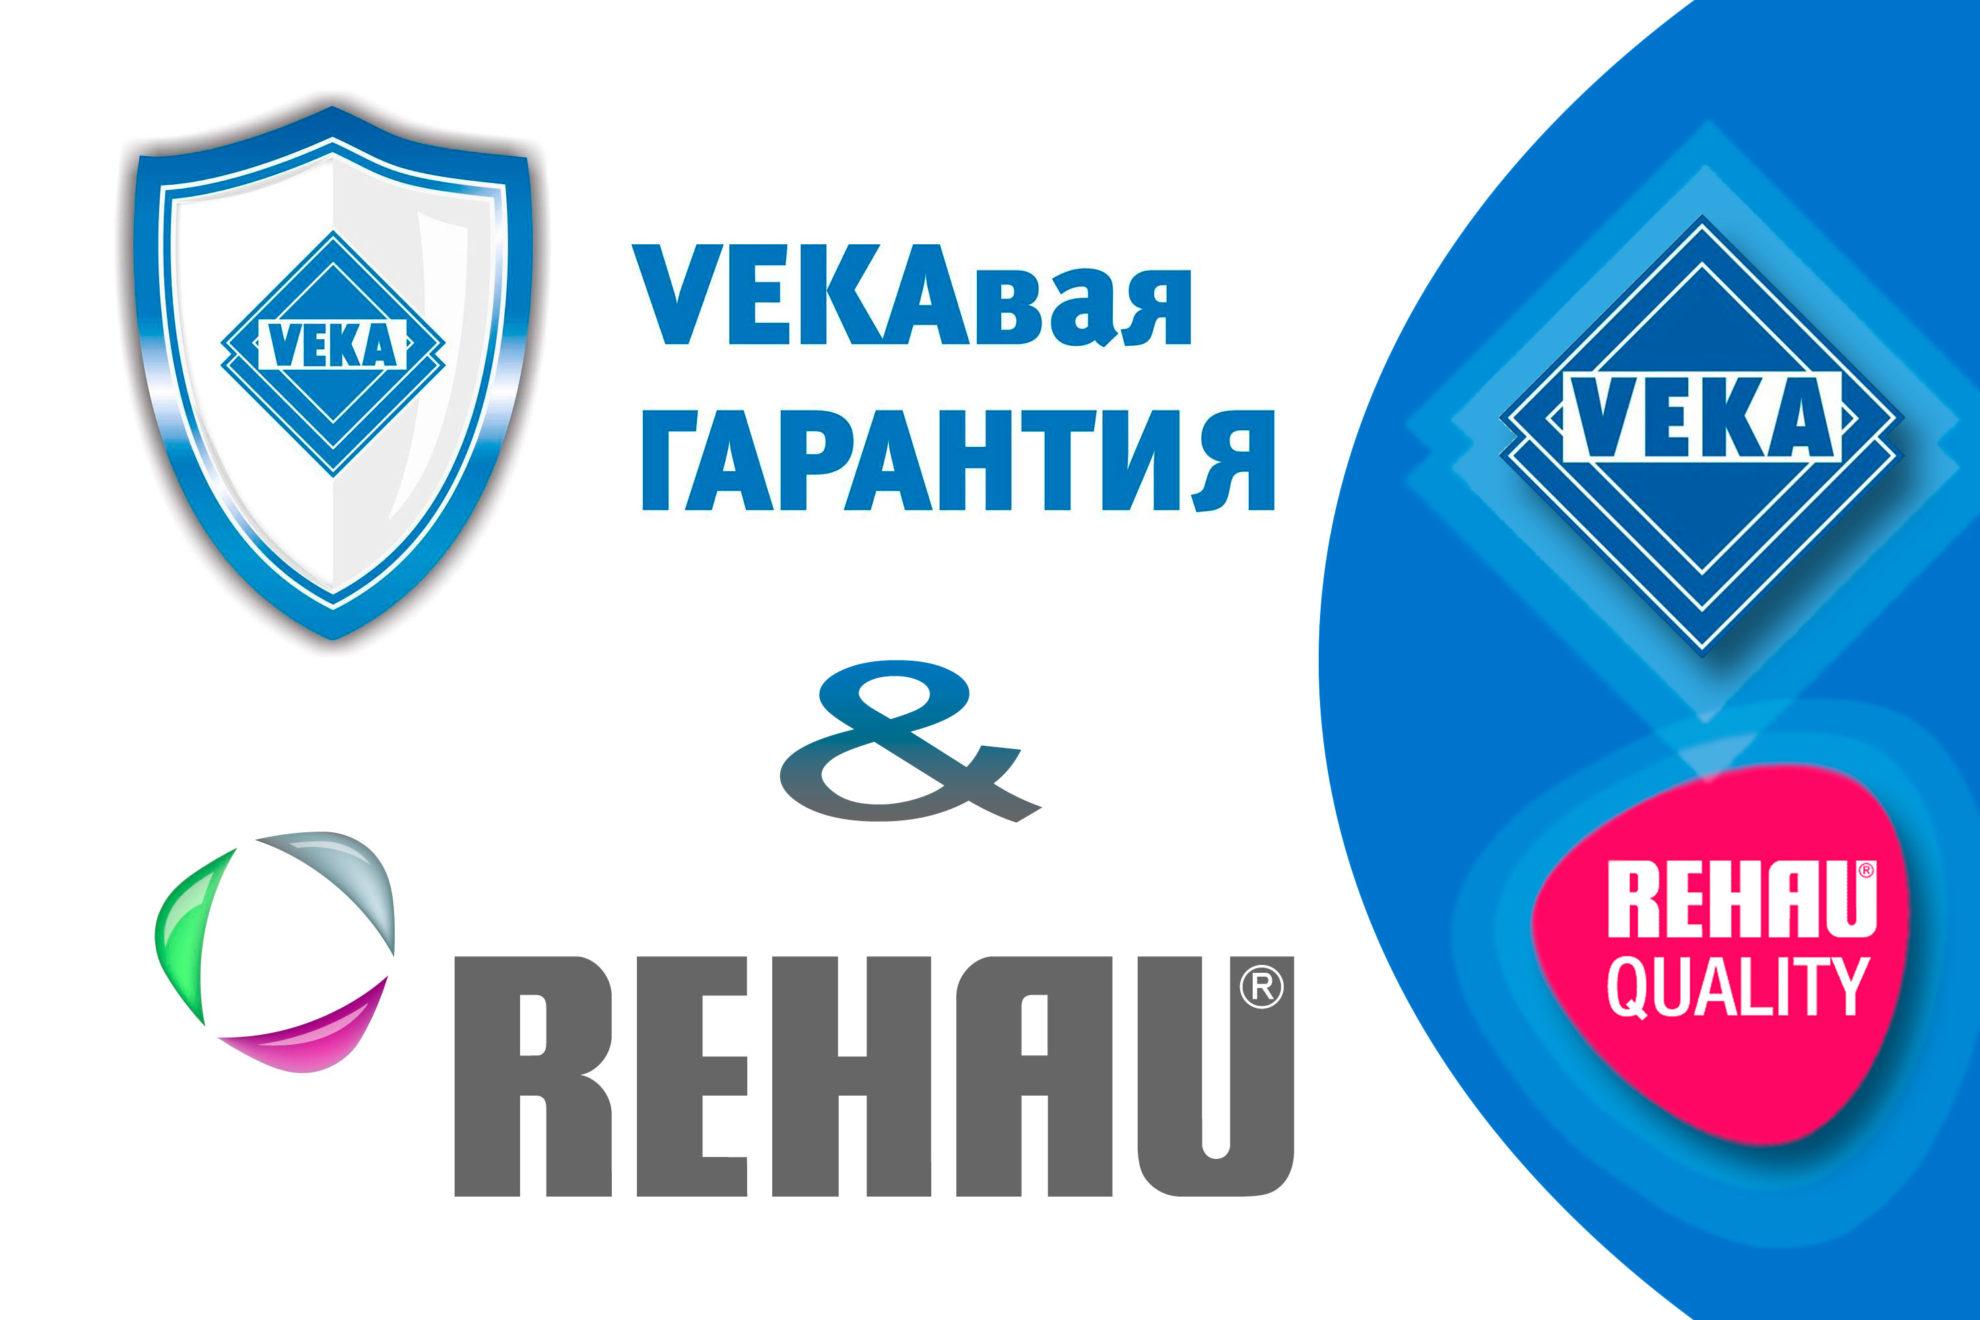 Veka или Rehau?